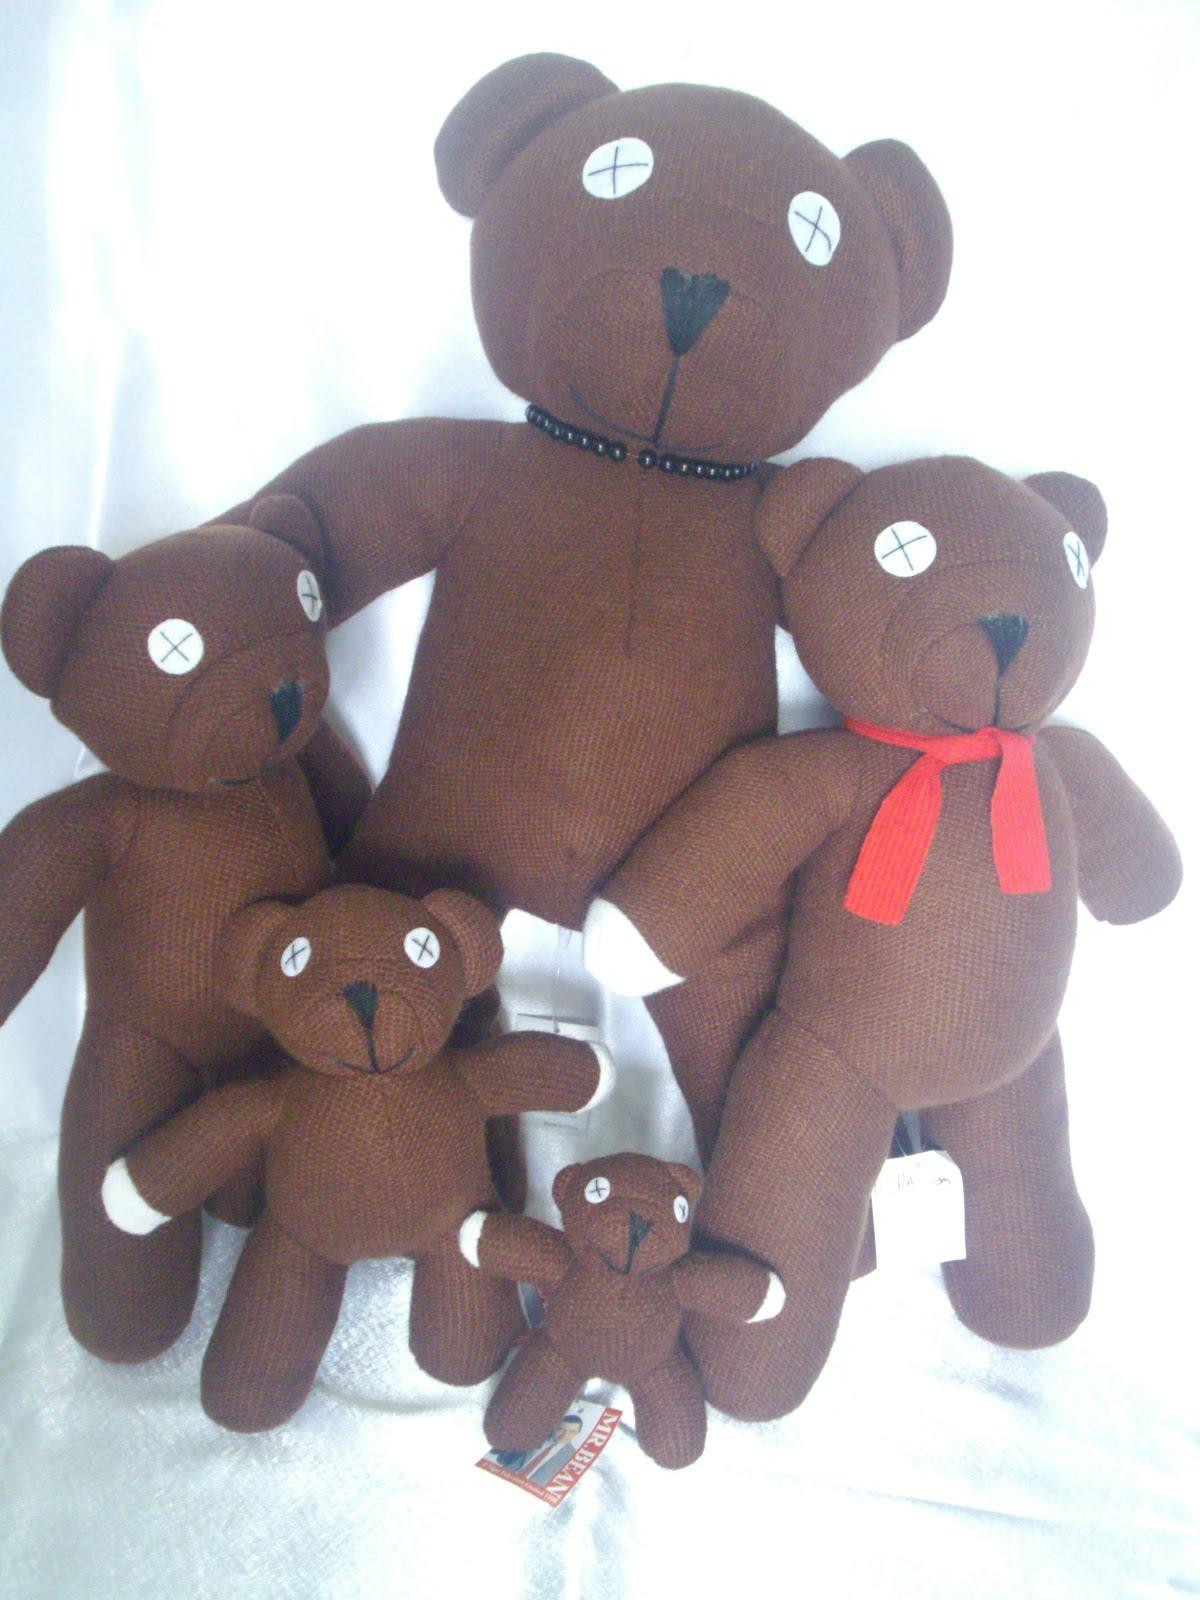 singaporegiftshop mr bean 39 s teddy bear. Black Bedroom Furniture Sets. Home Design Ideas